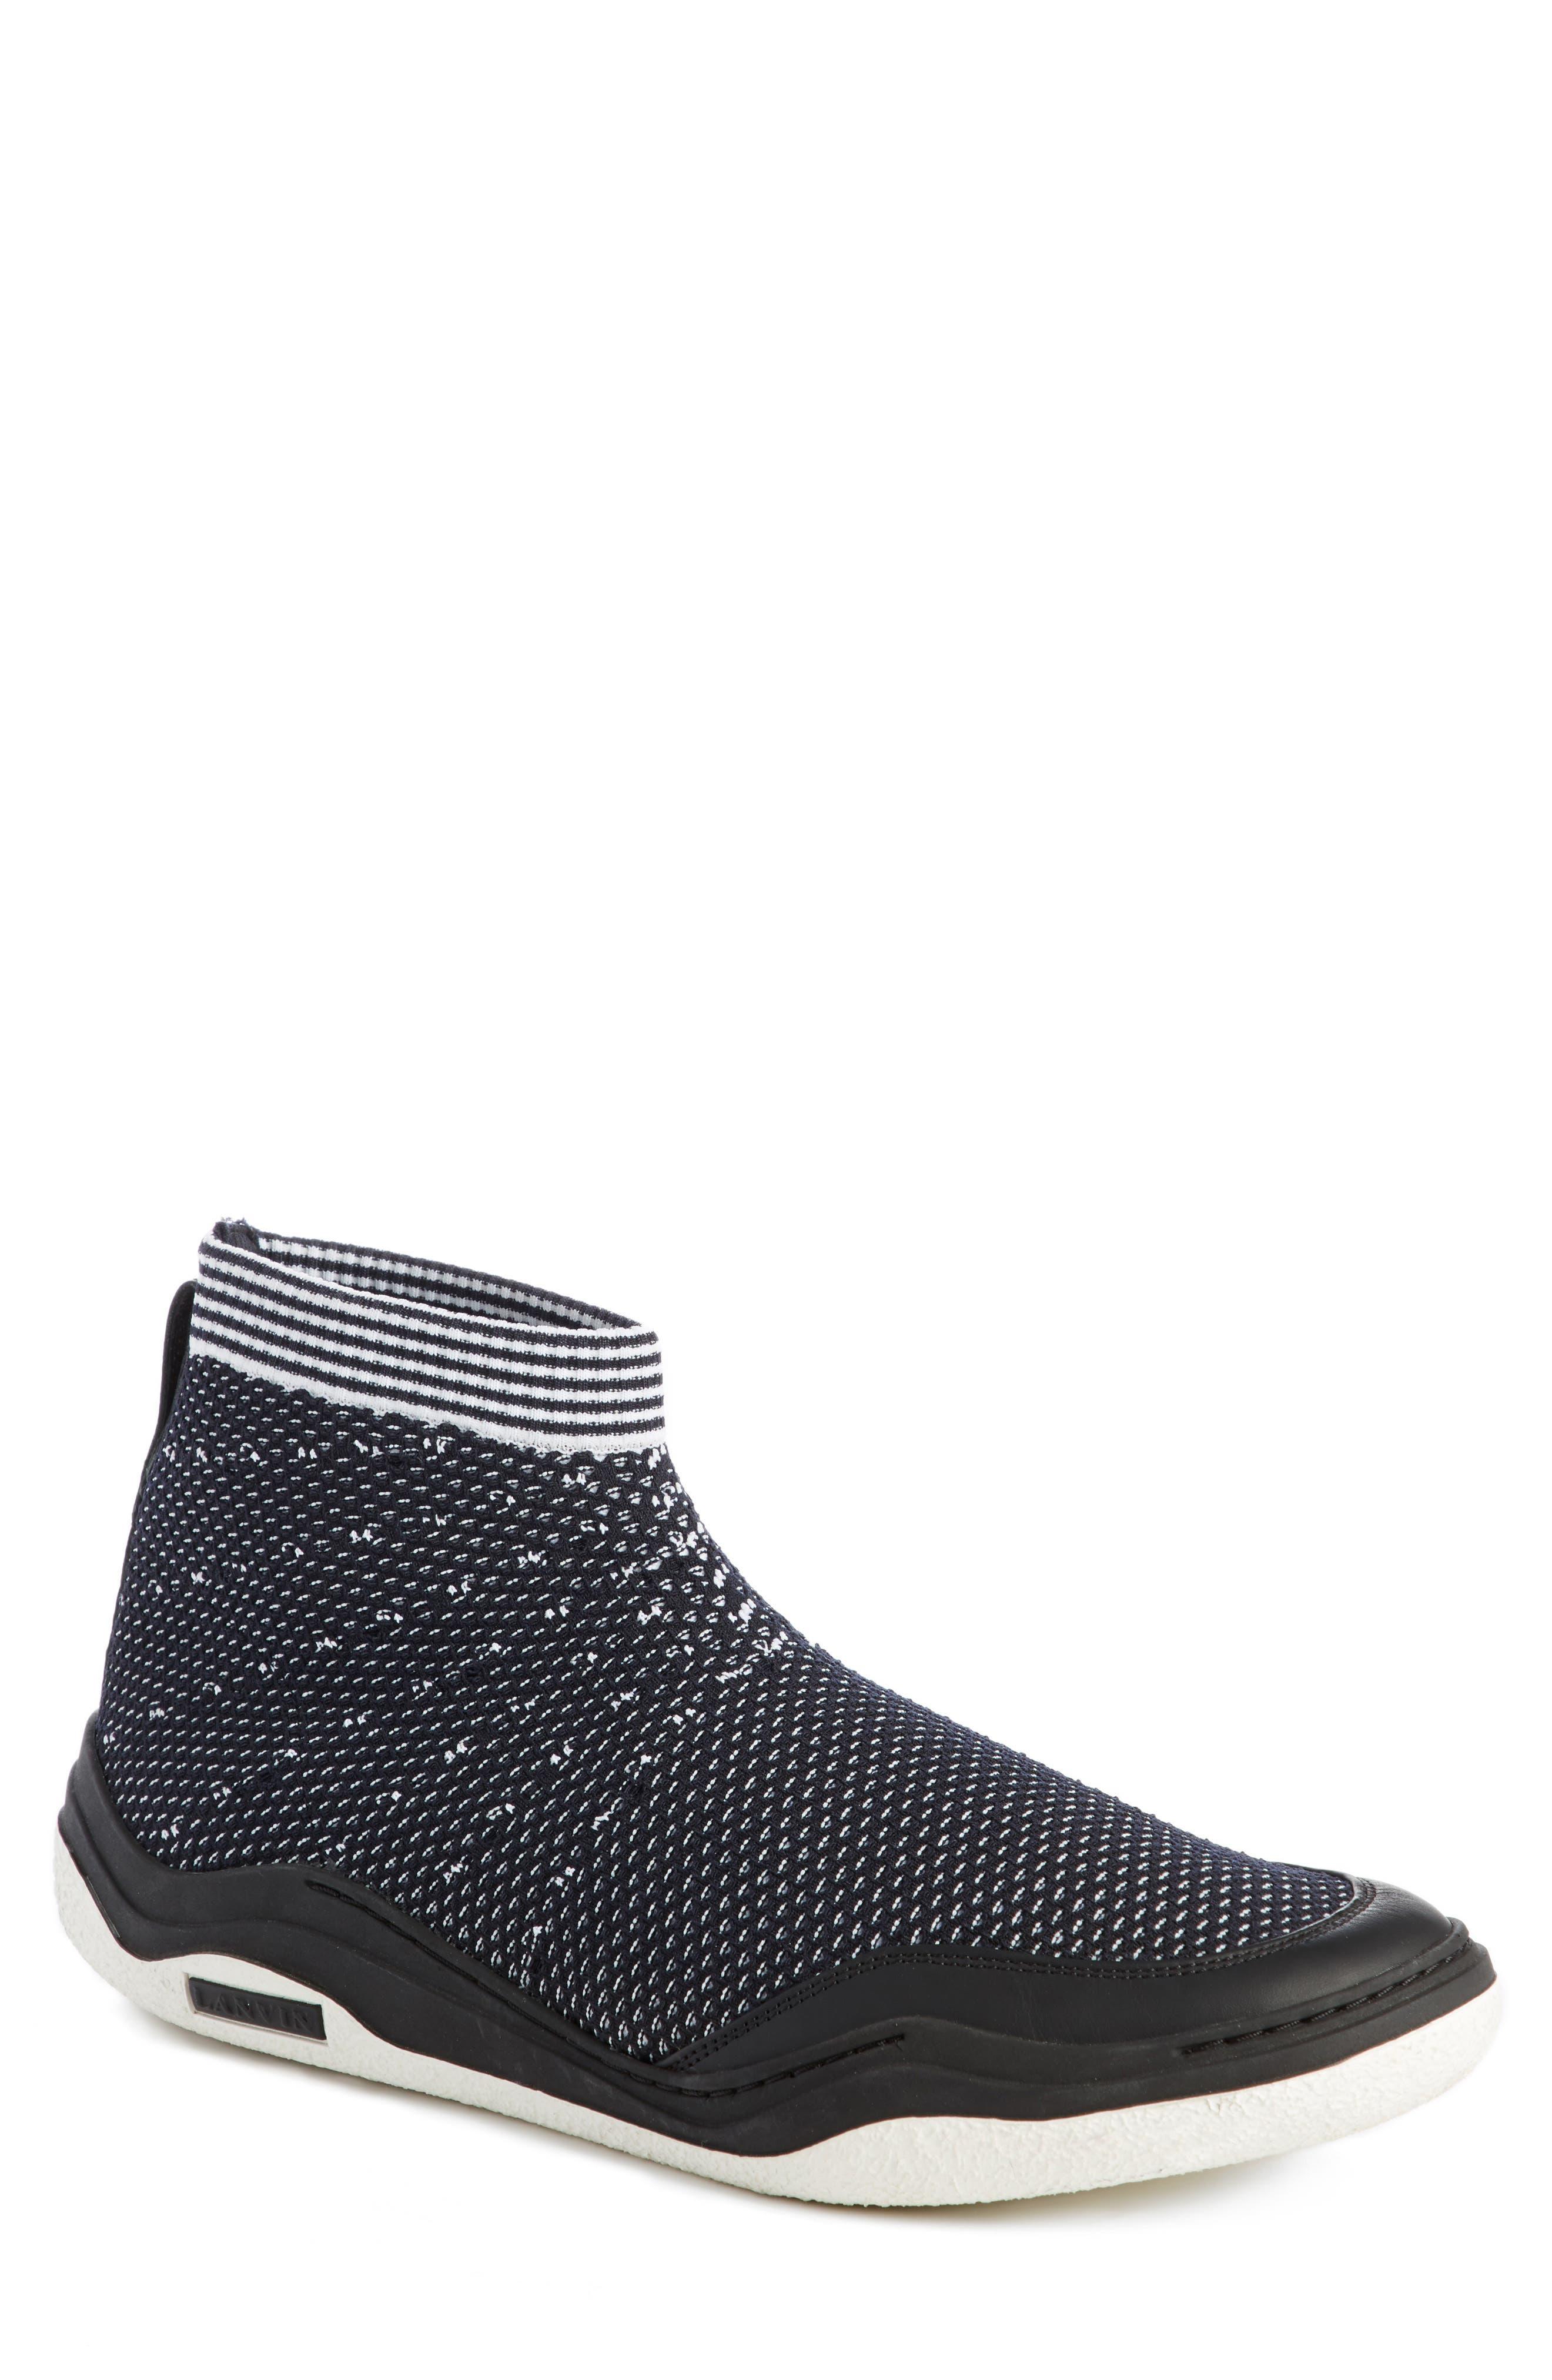 Knit Sneaker,                             Main thumbnail 1, color,                             004